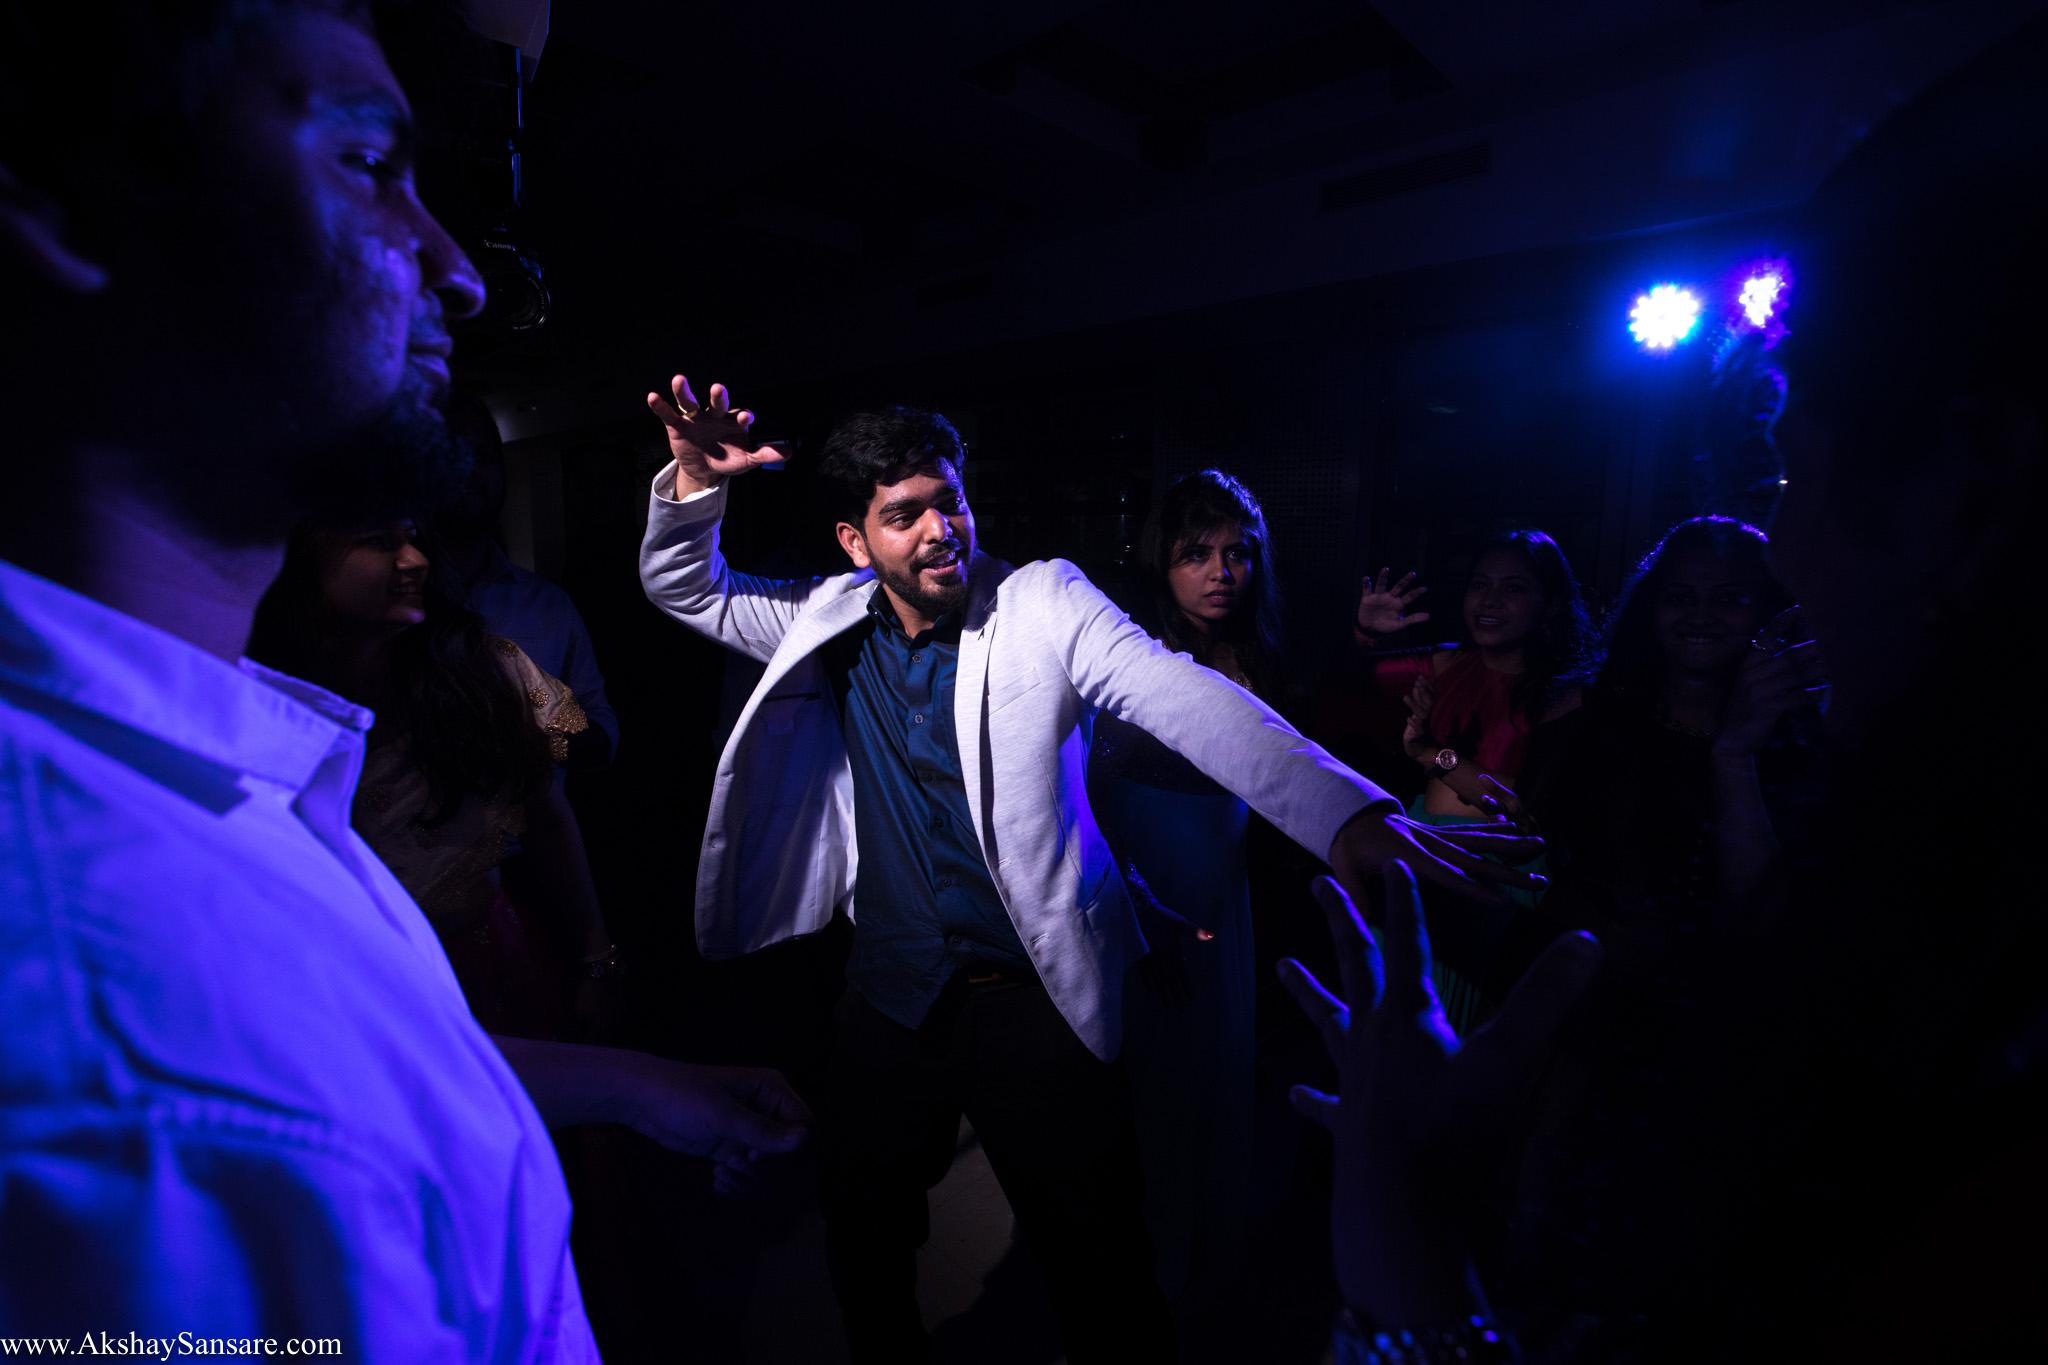 Akshay Sansare Best Candid Photographers in Mumbai (11).jpg